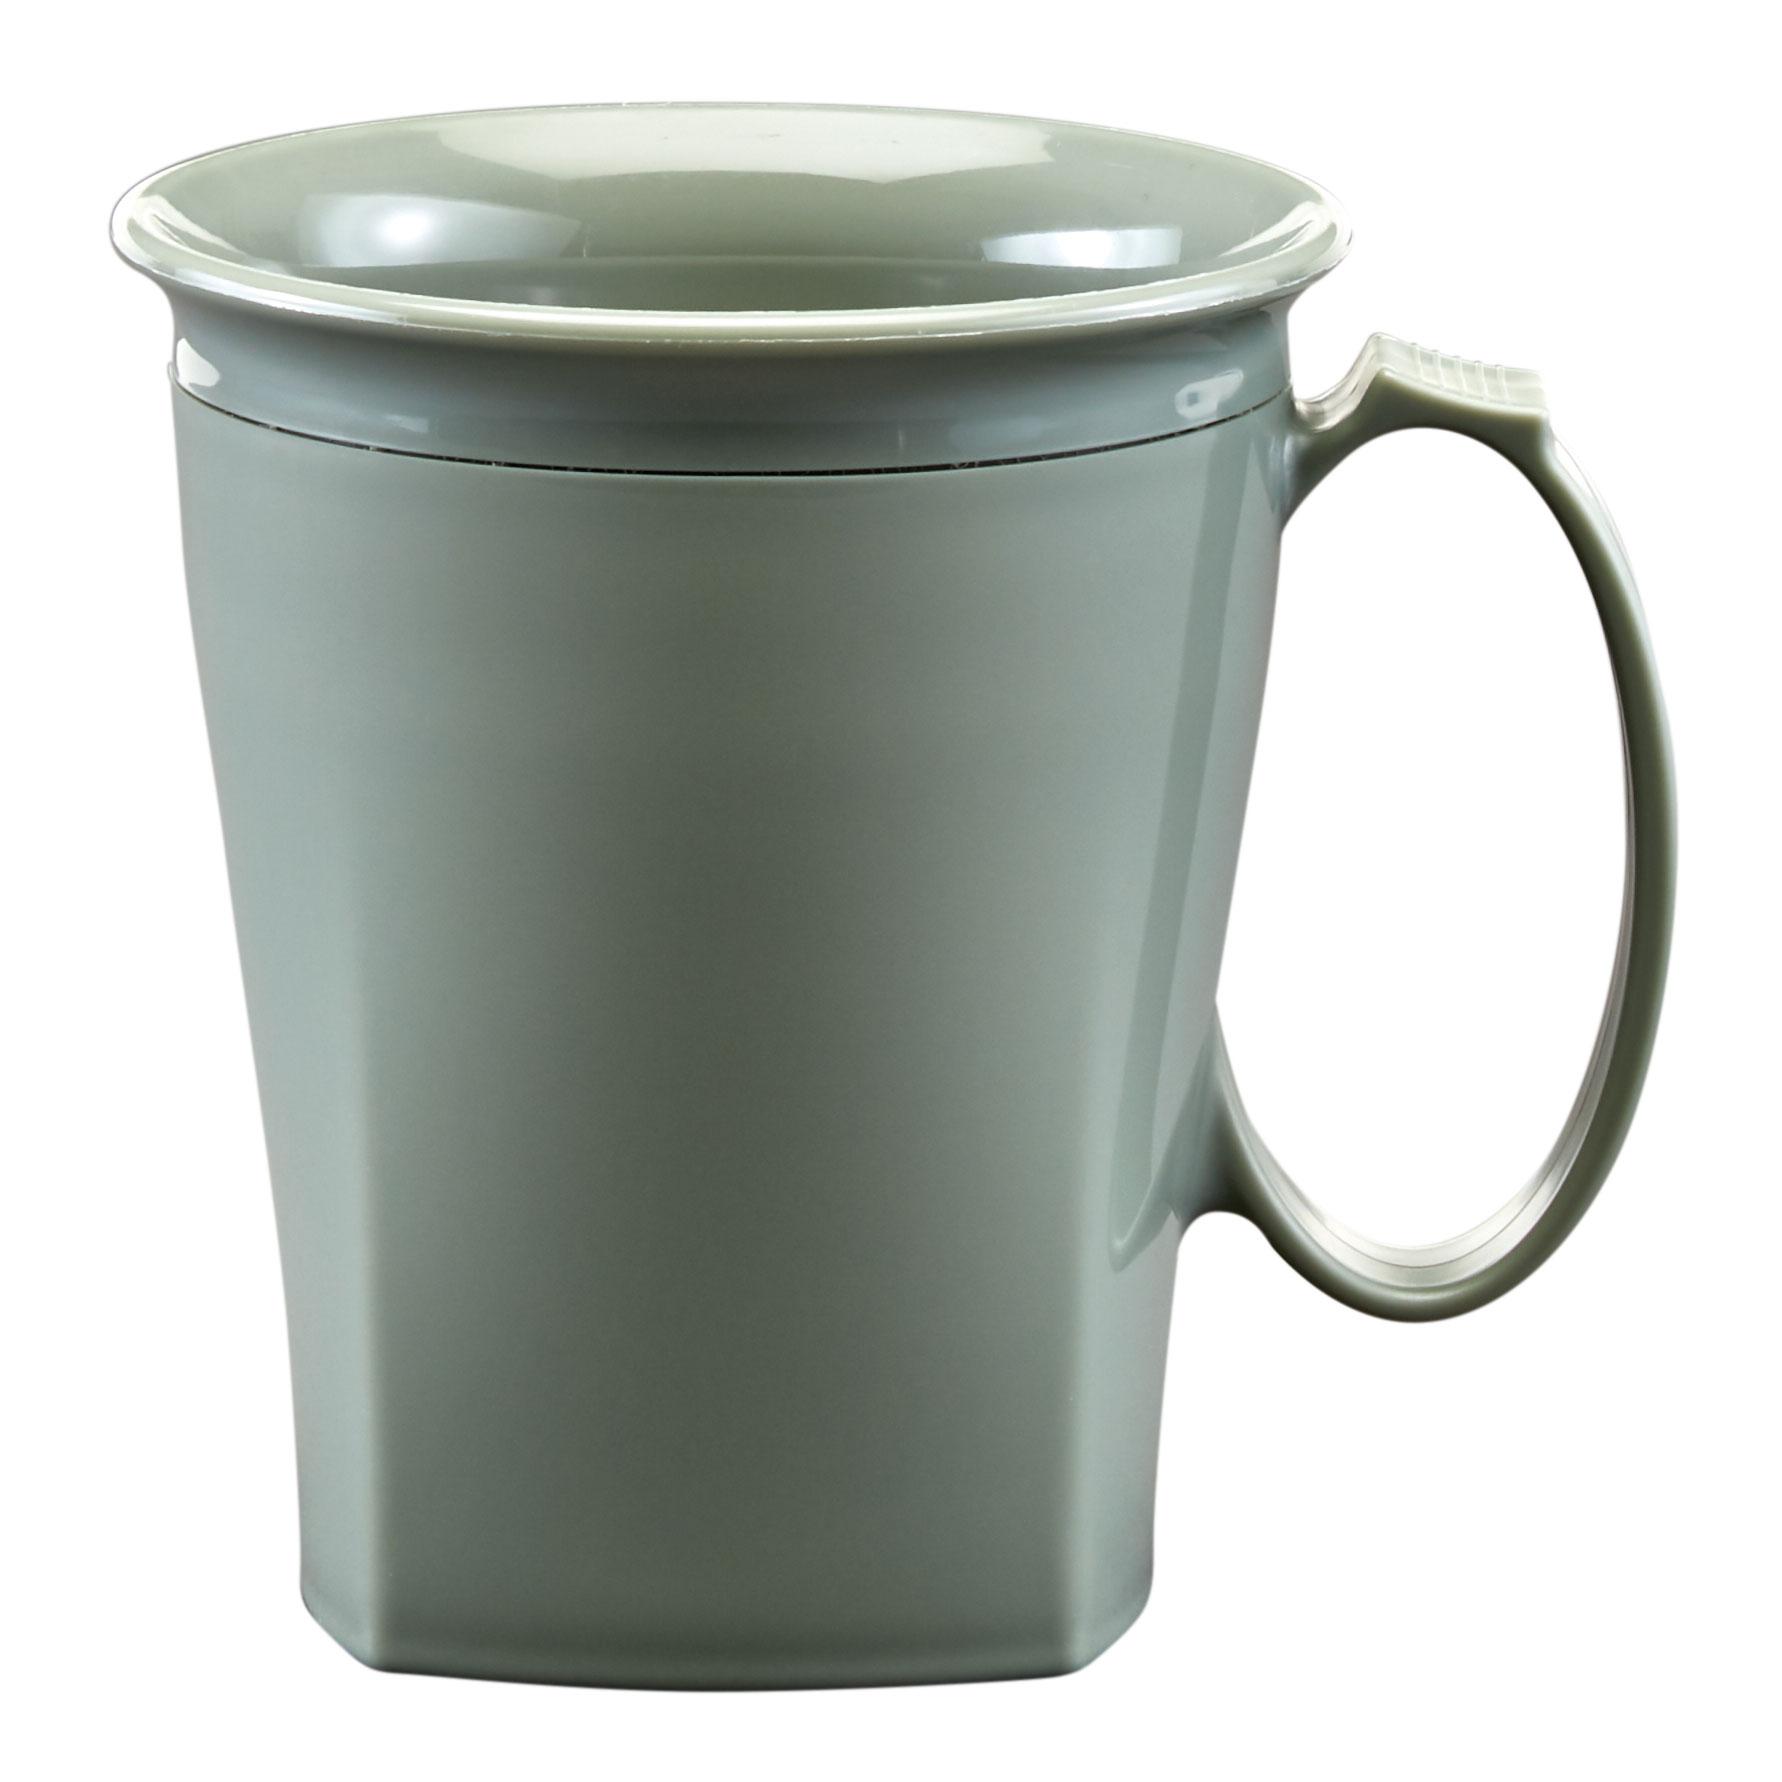 Cambro MDSHM8447 mugs/cups (non disposable)